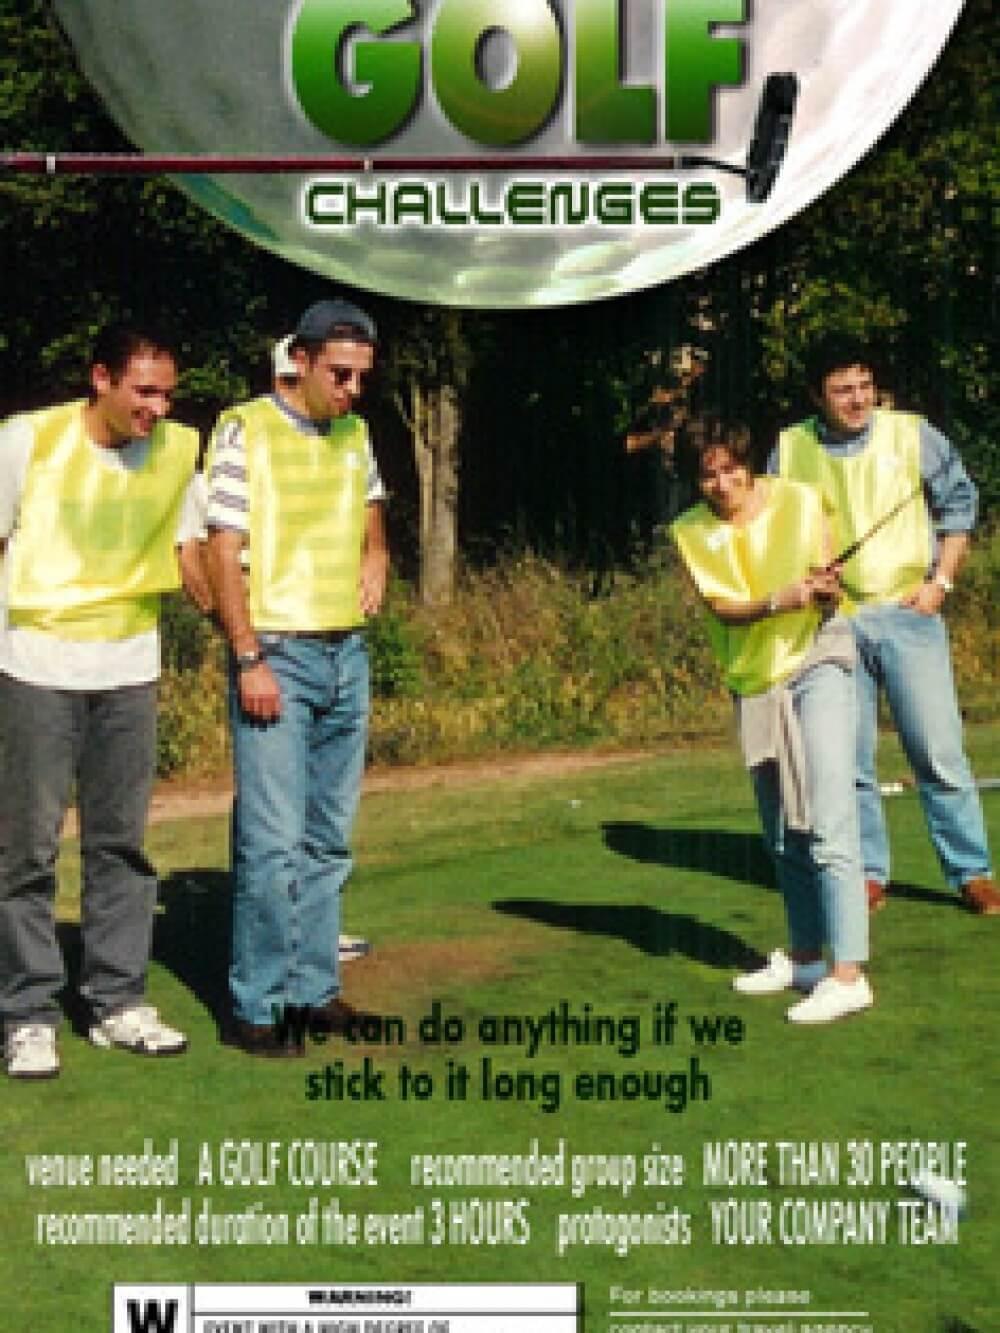 golf_challenges_vertical_web